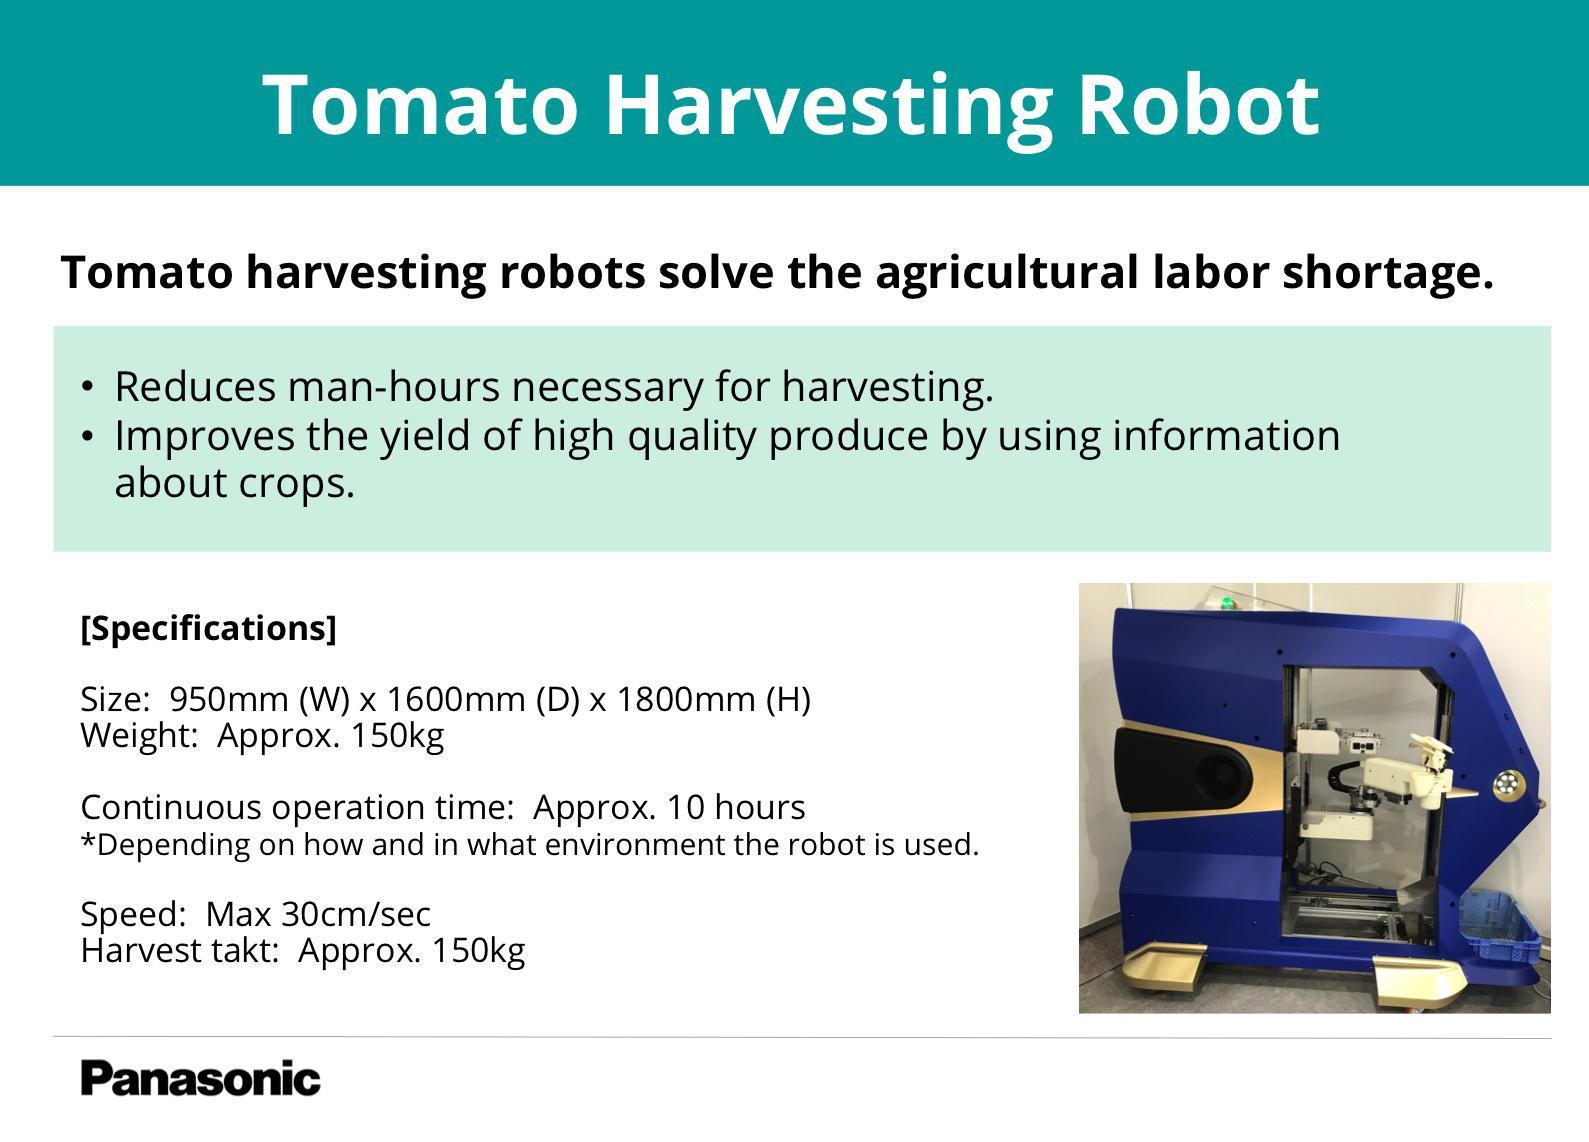 photo: Tomato Harvesting Robot